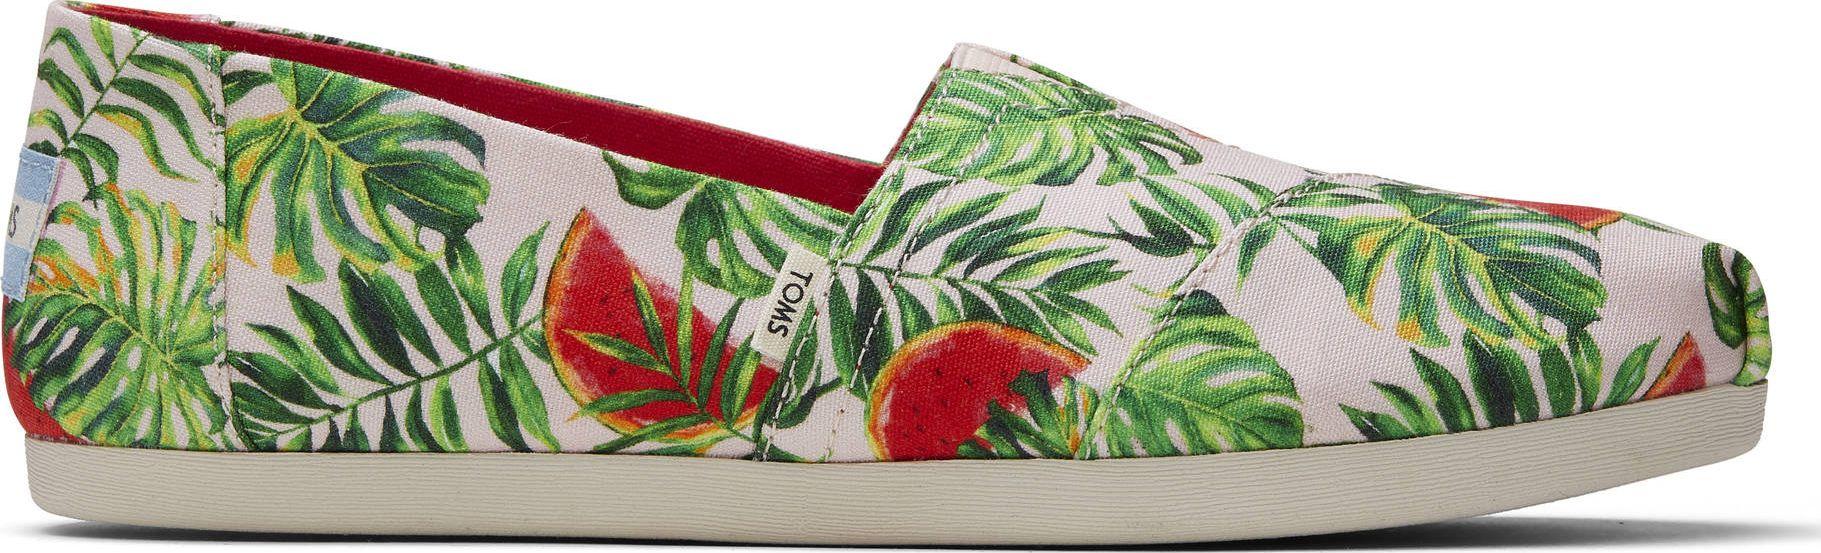 TOMS Watermelon Palms Print Women's Alpargata Pink 36